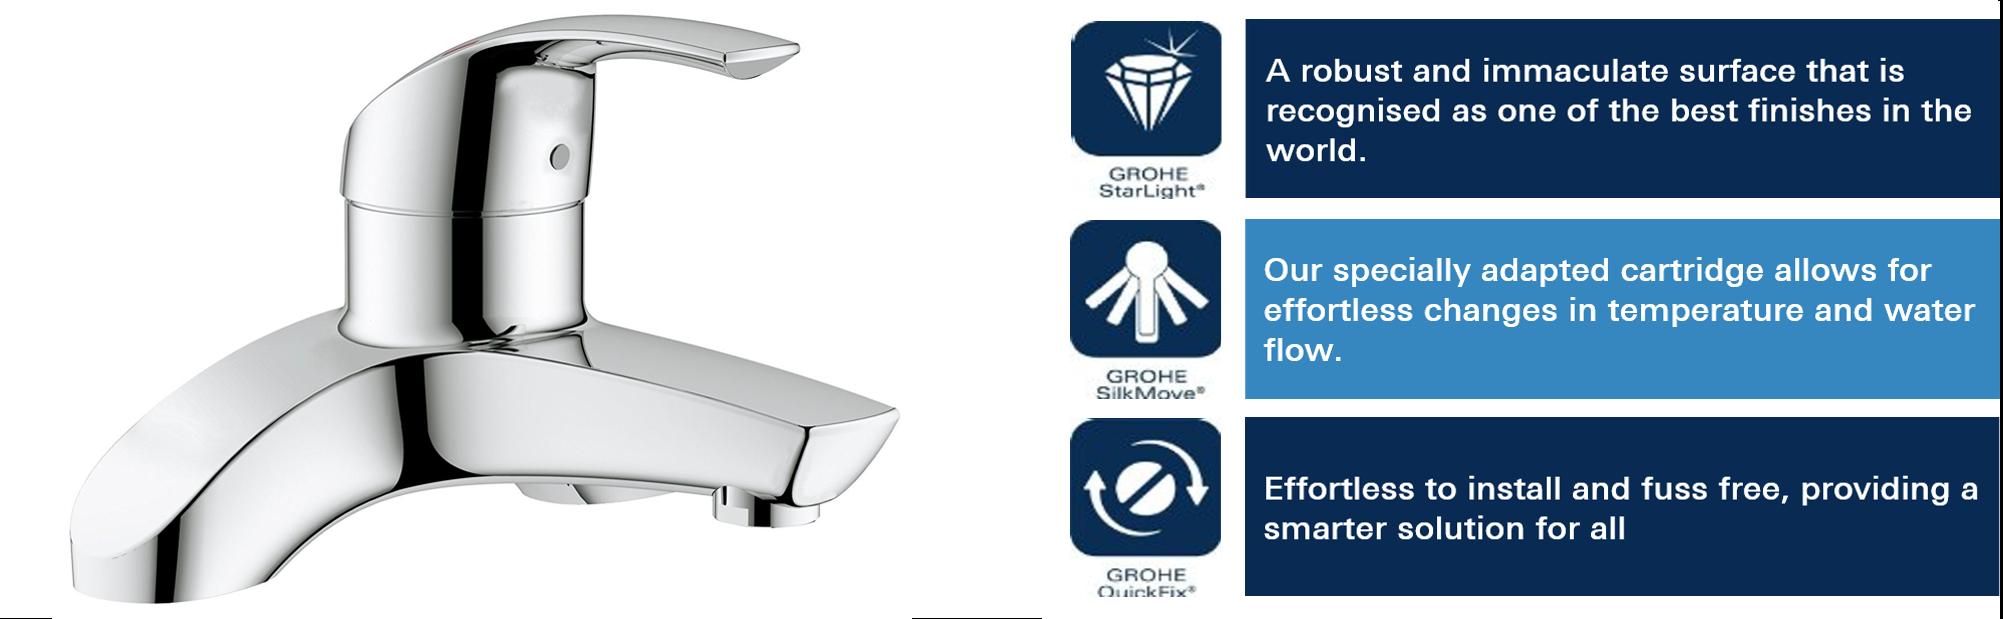 GROHE 25098000 | Eurosmart Bath Filler - chrome: Amazon.co.uk: DIY ...